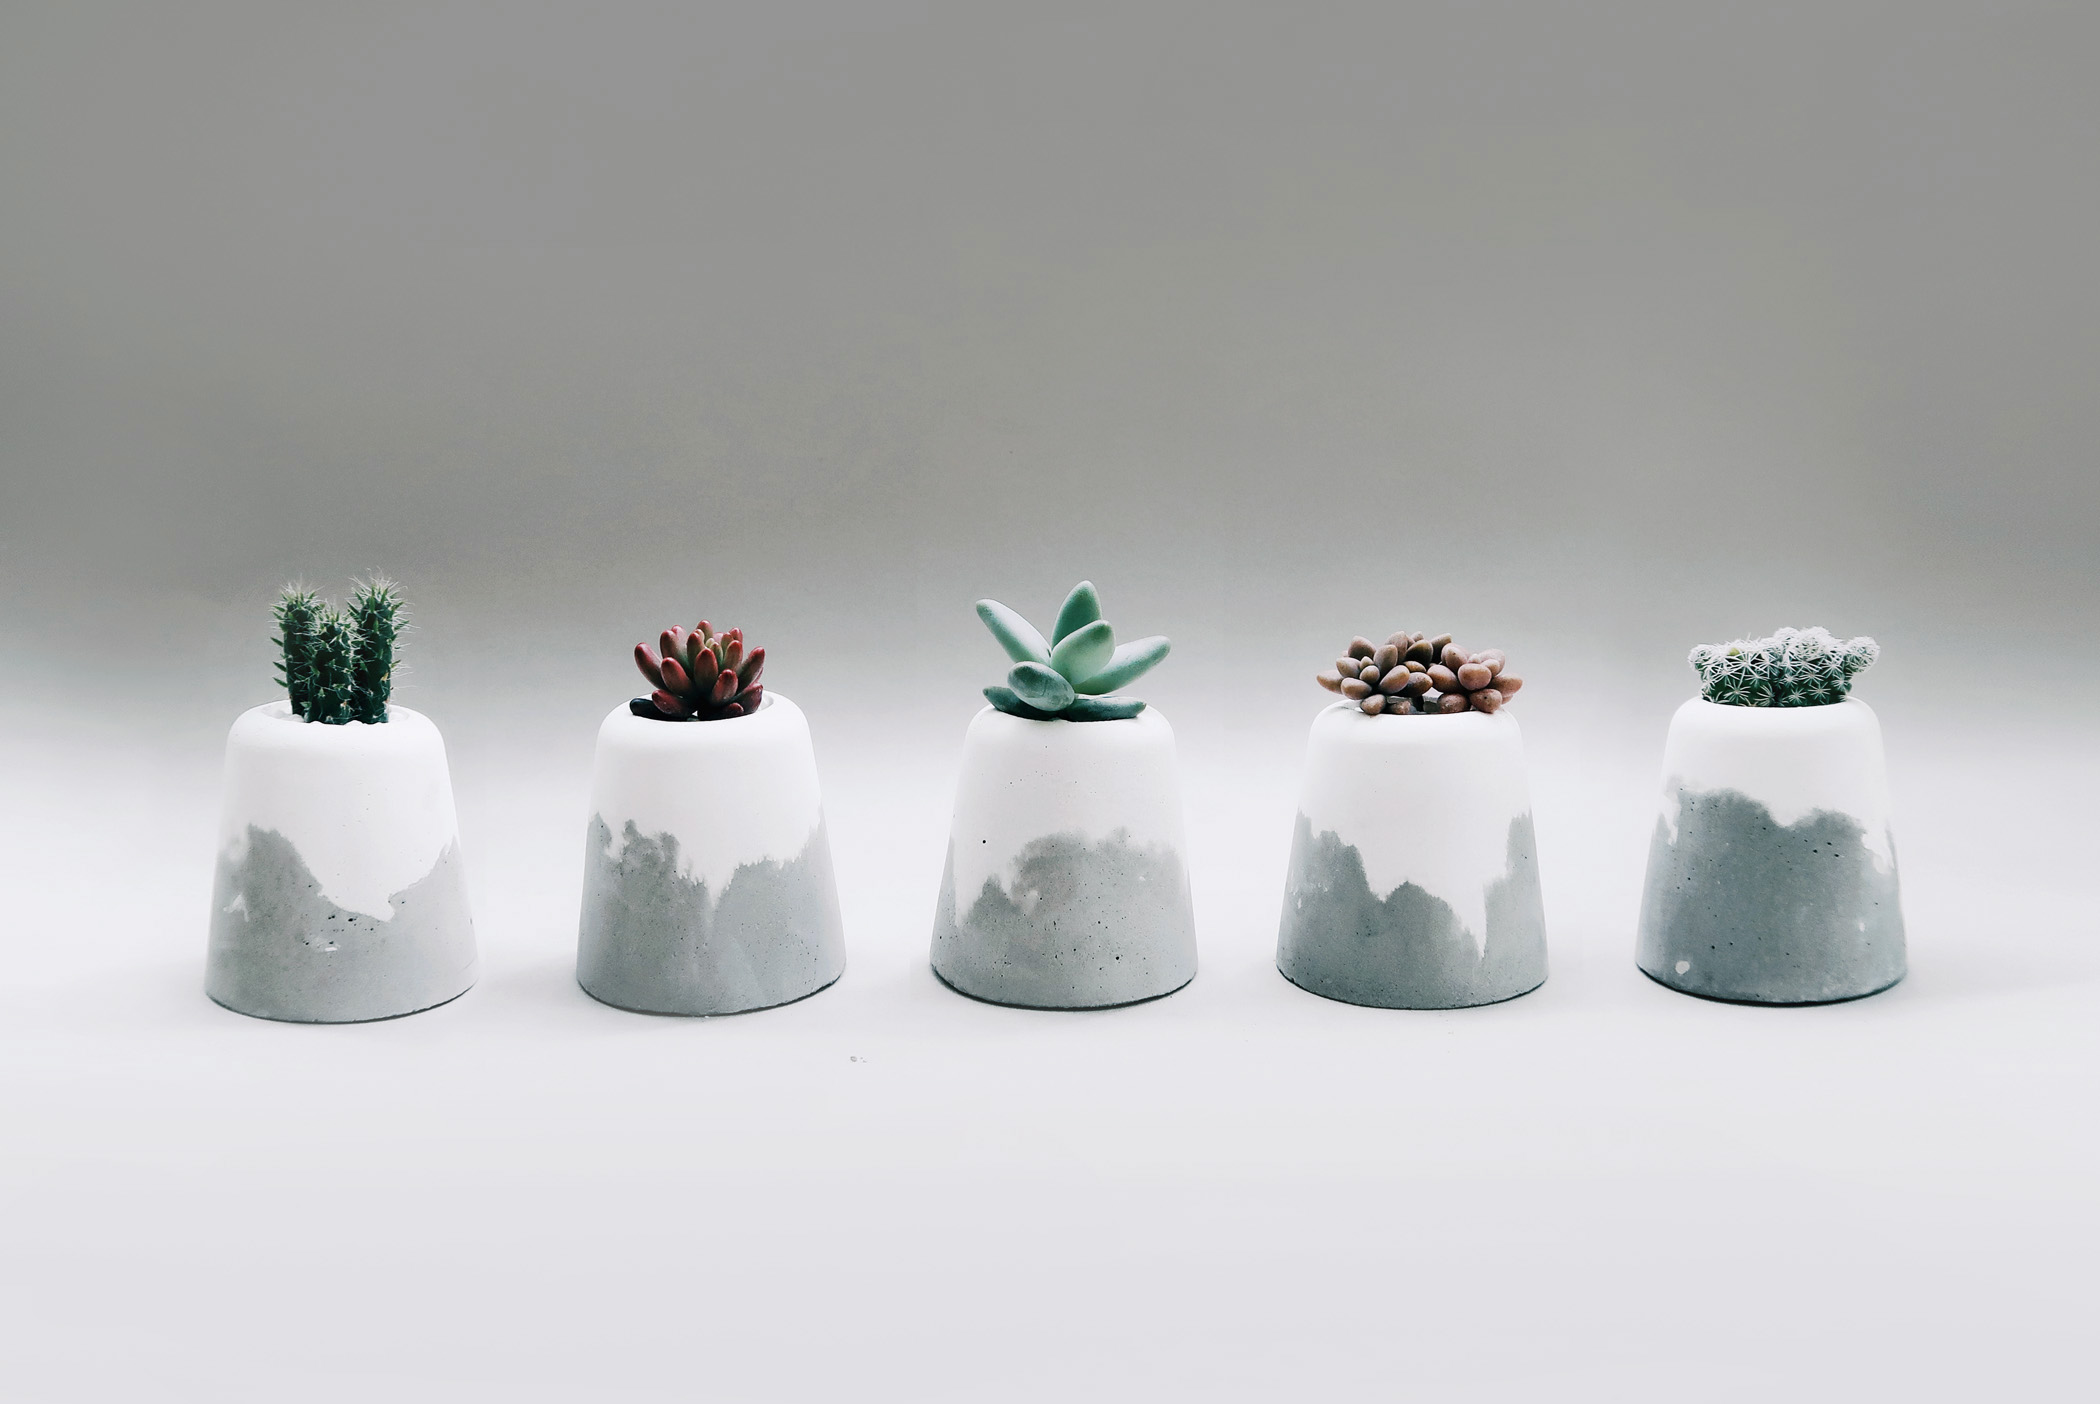 SNOW VOLCANO 小雪火山雙色水泥盆栽